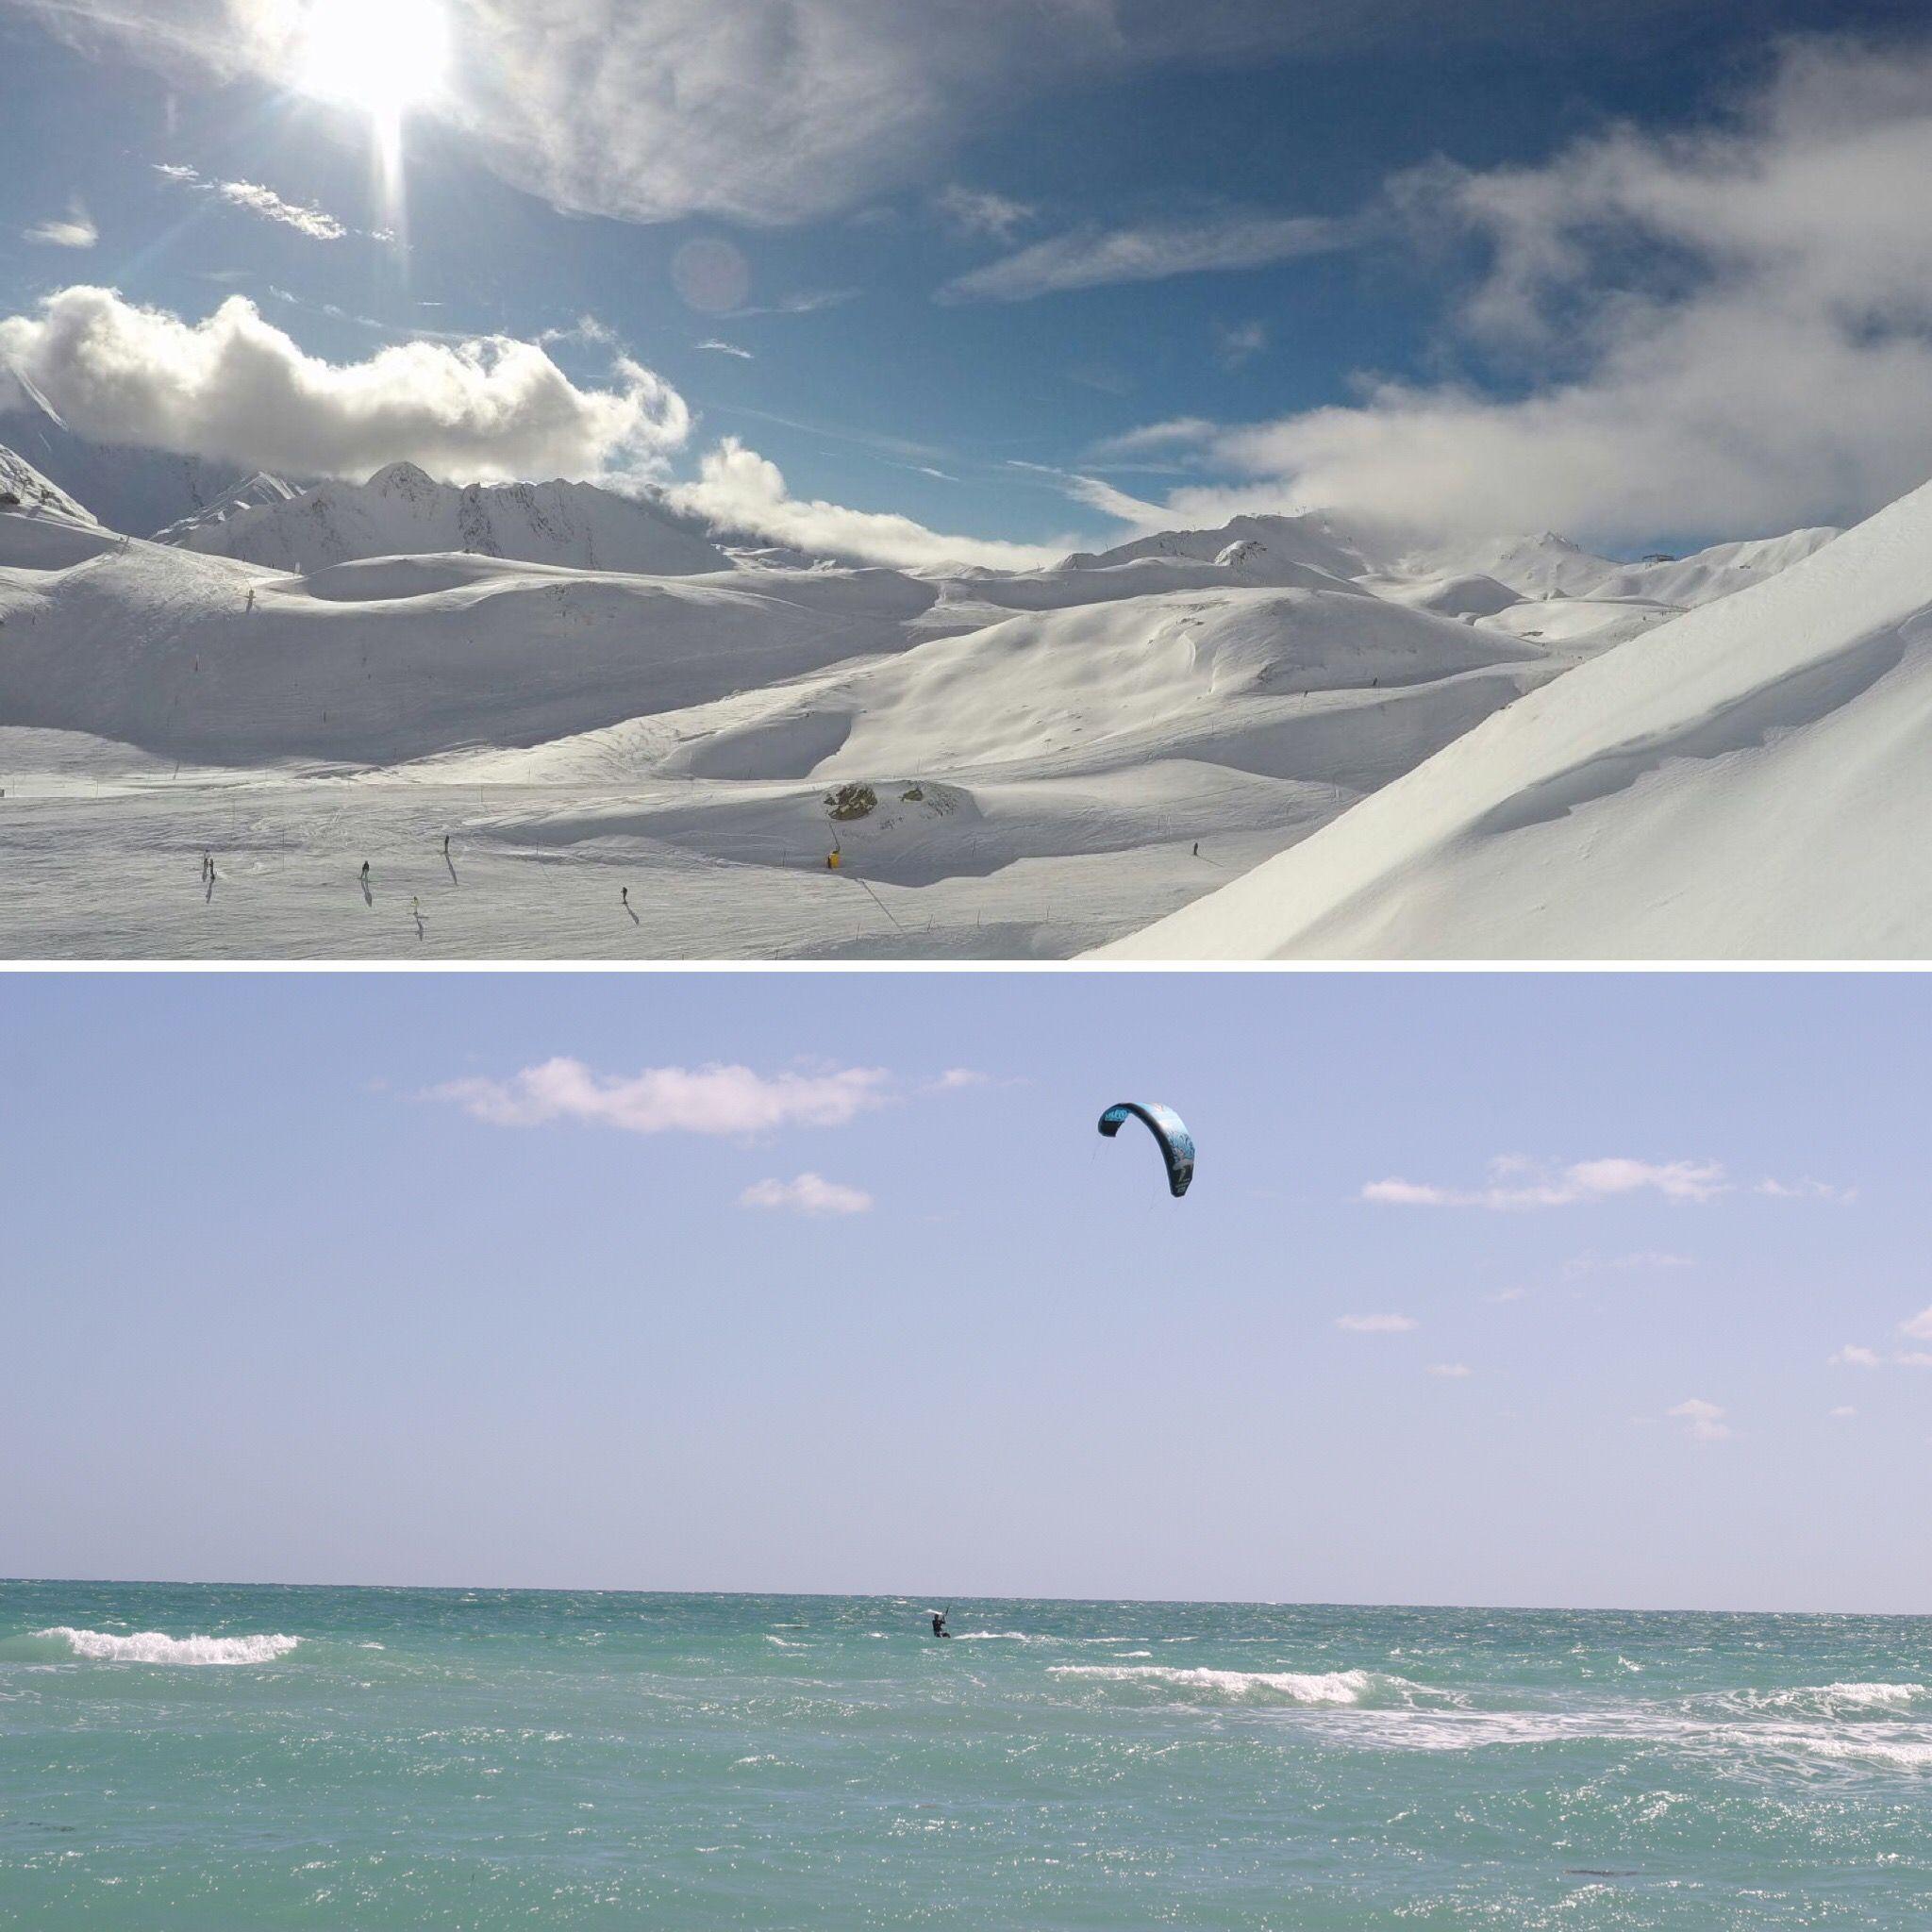 Snowboarden versus Kiteboarden